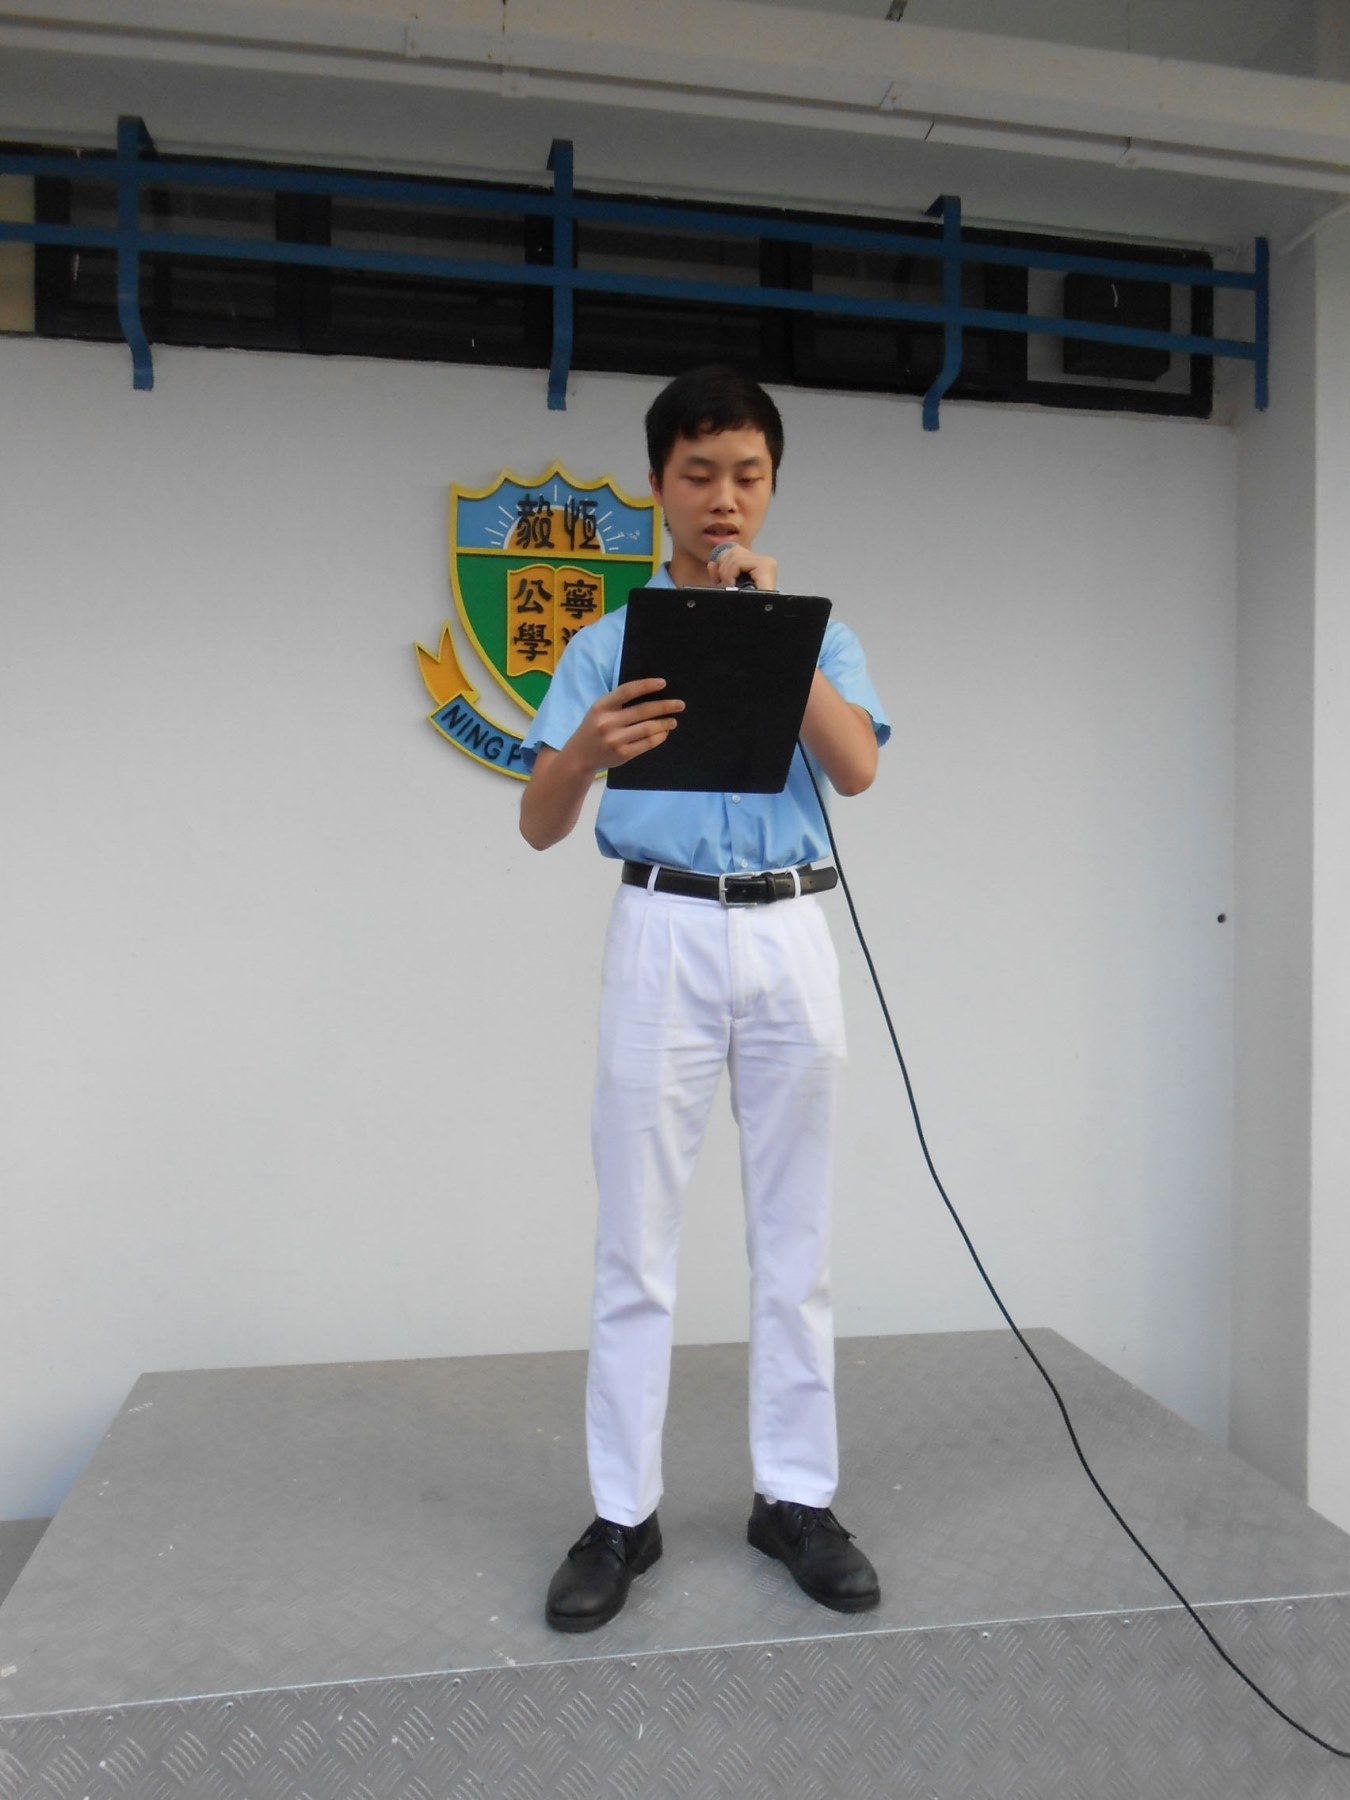 http://npc.edu.hk/sites/default/files/dscn9561.jpg